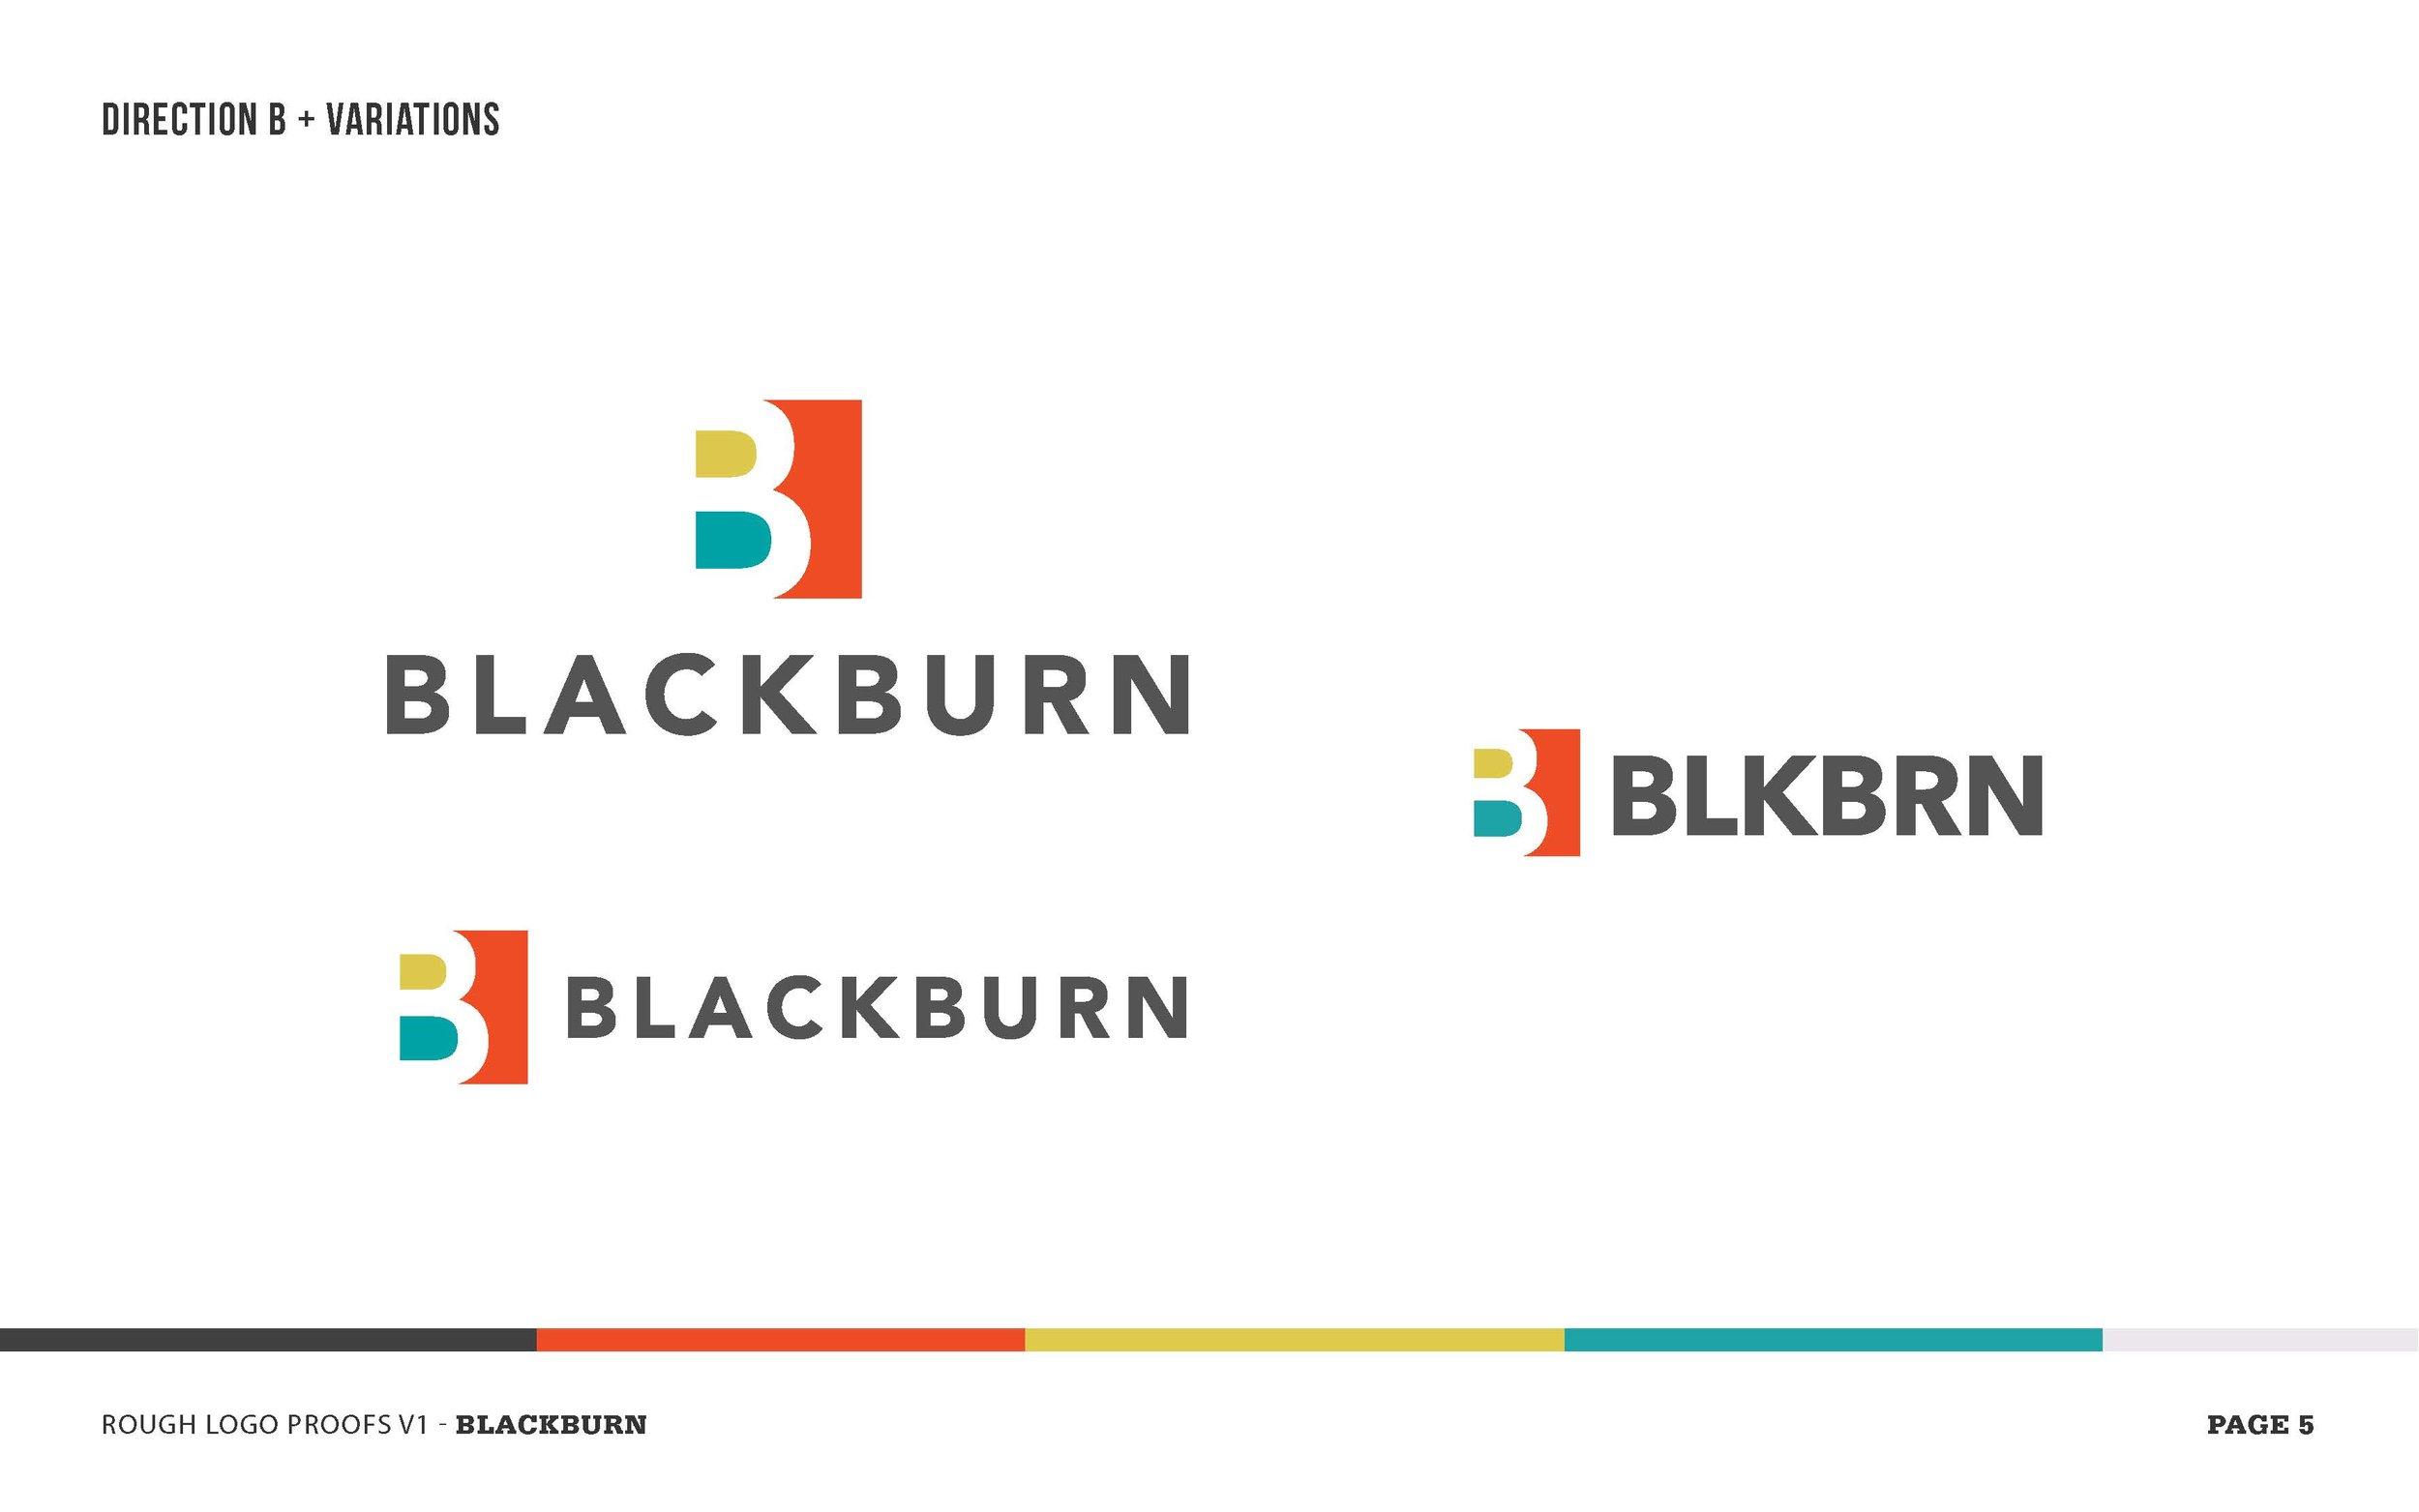 blkbrn-logo-rough-presentation-v1-max_Page_5.jpg